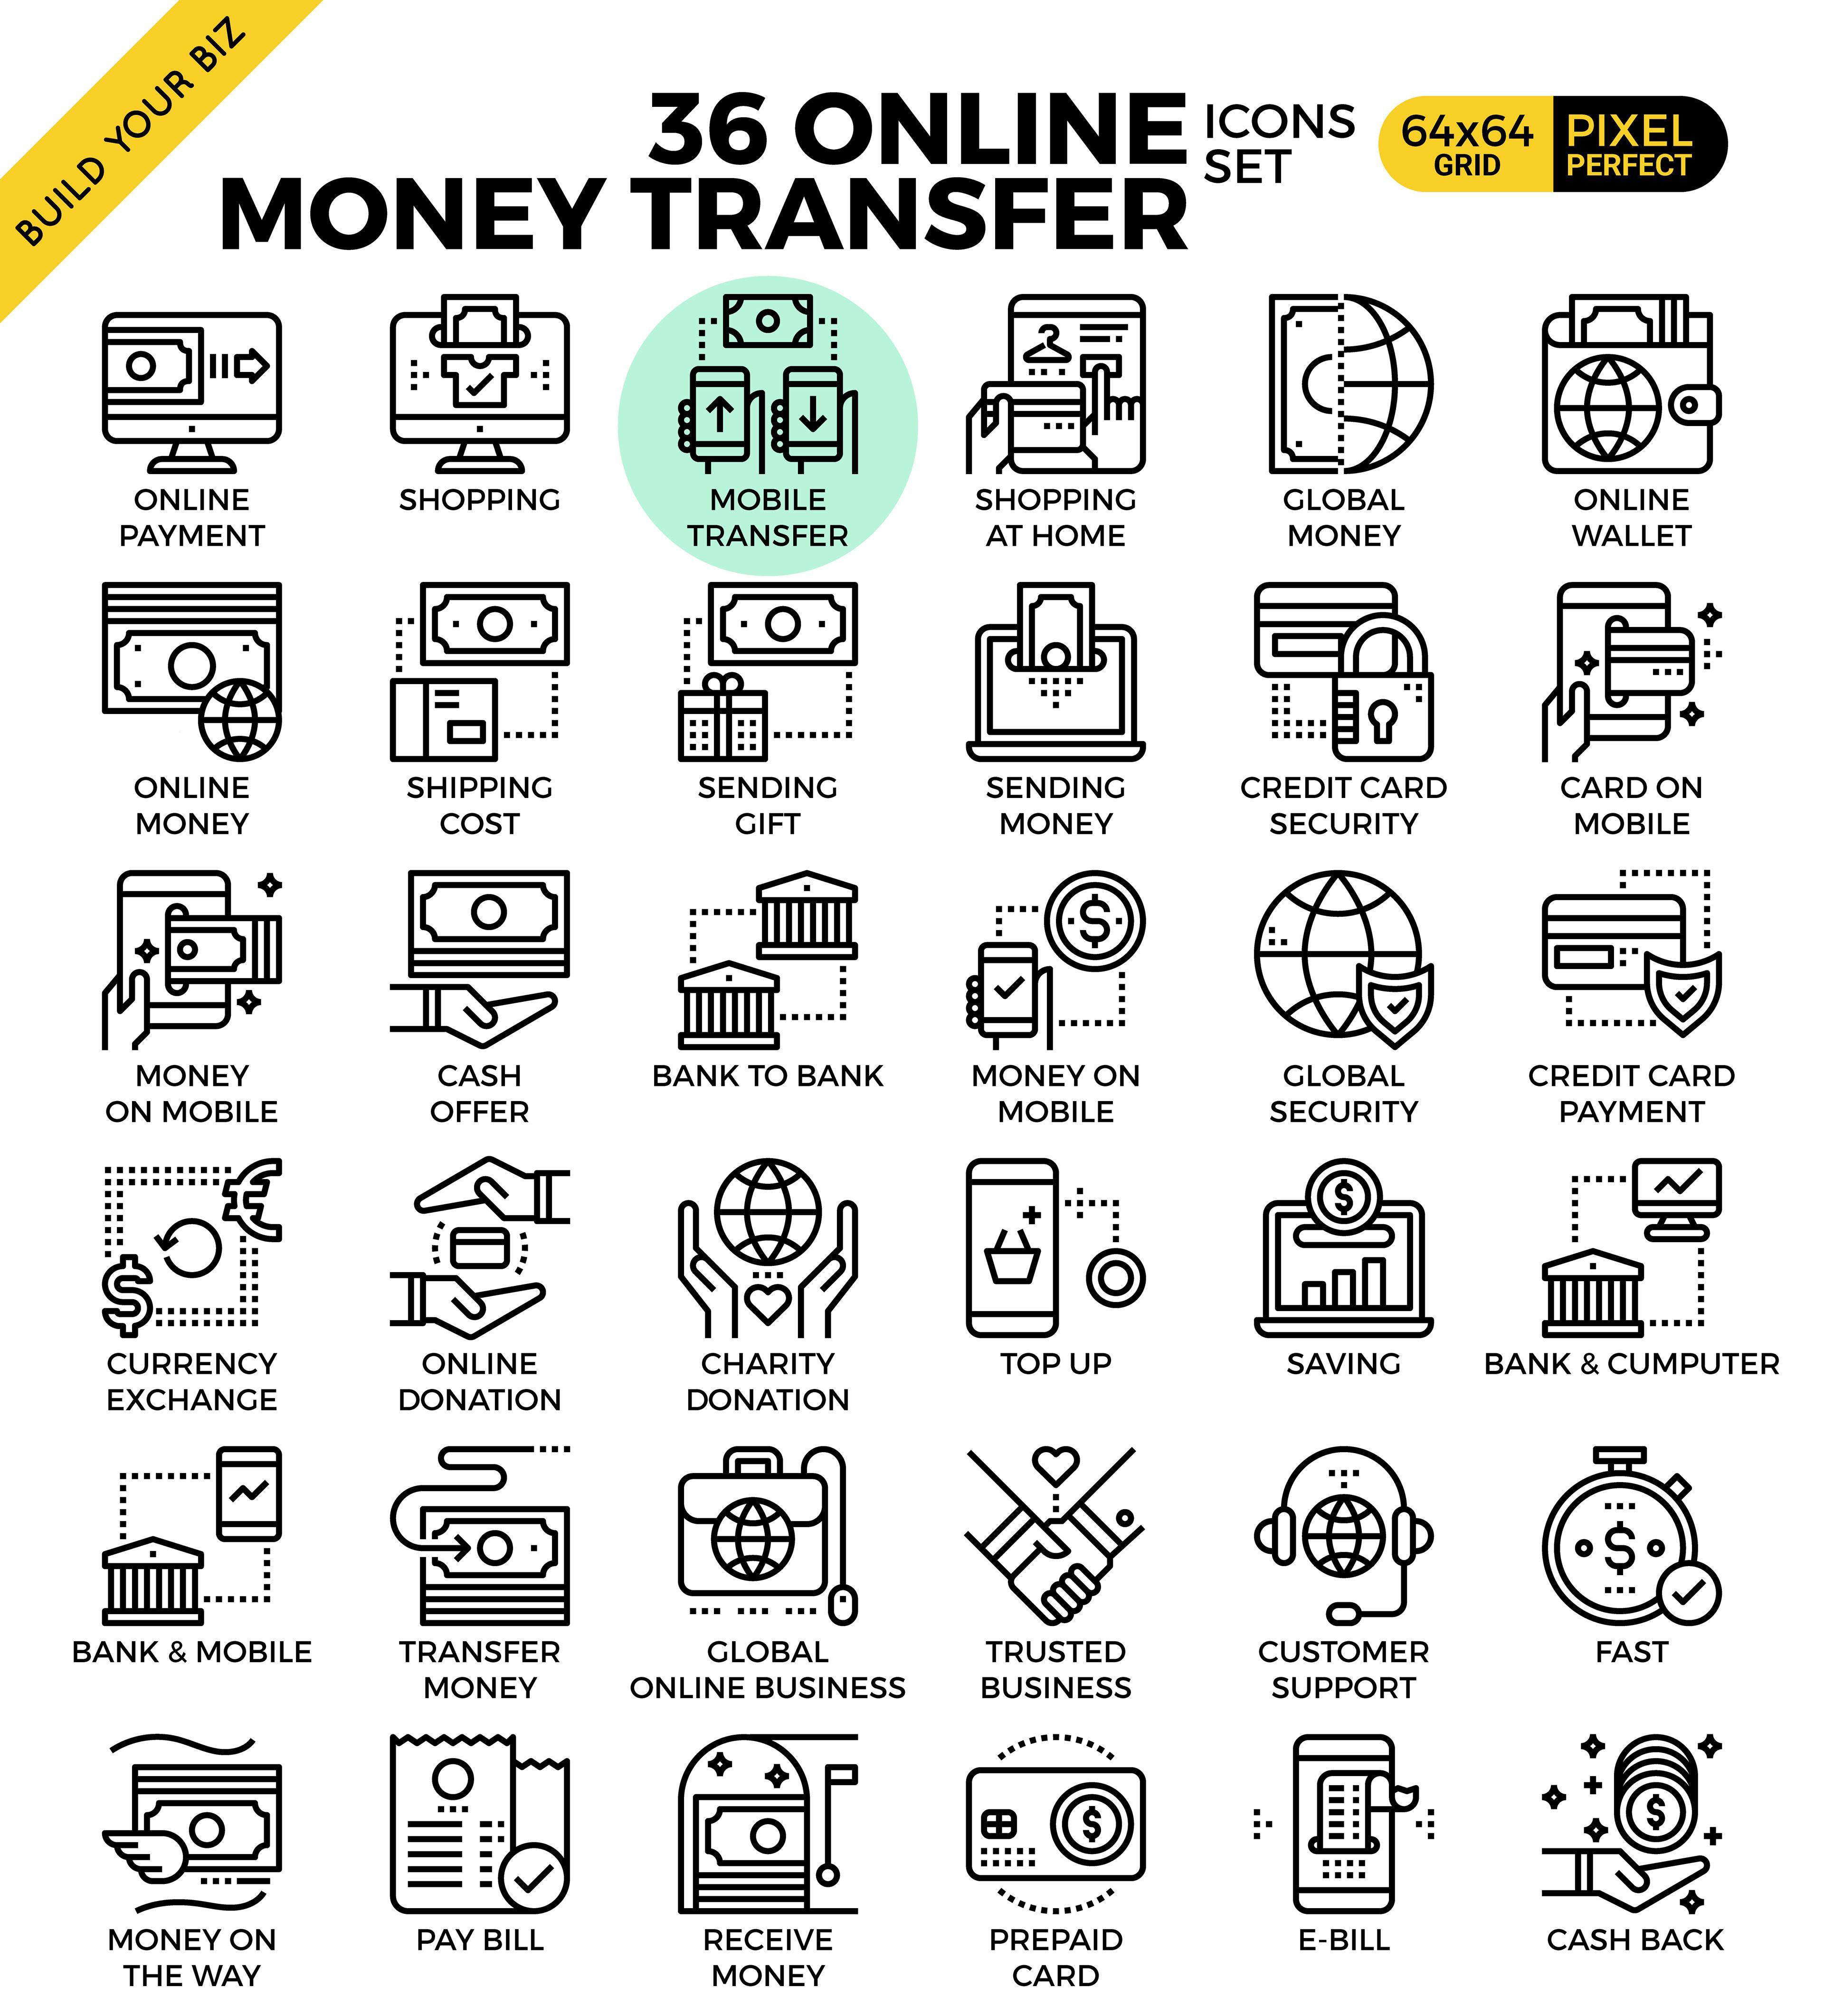 Luxury Wire Money Online Credit Card Ideas - The Wire - magnox.info